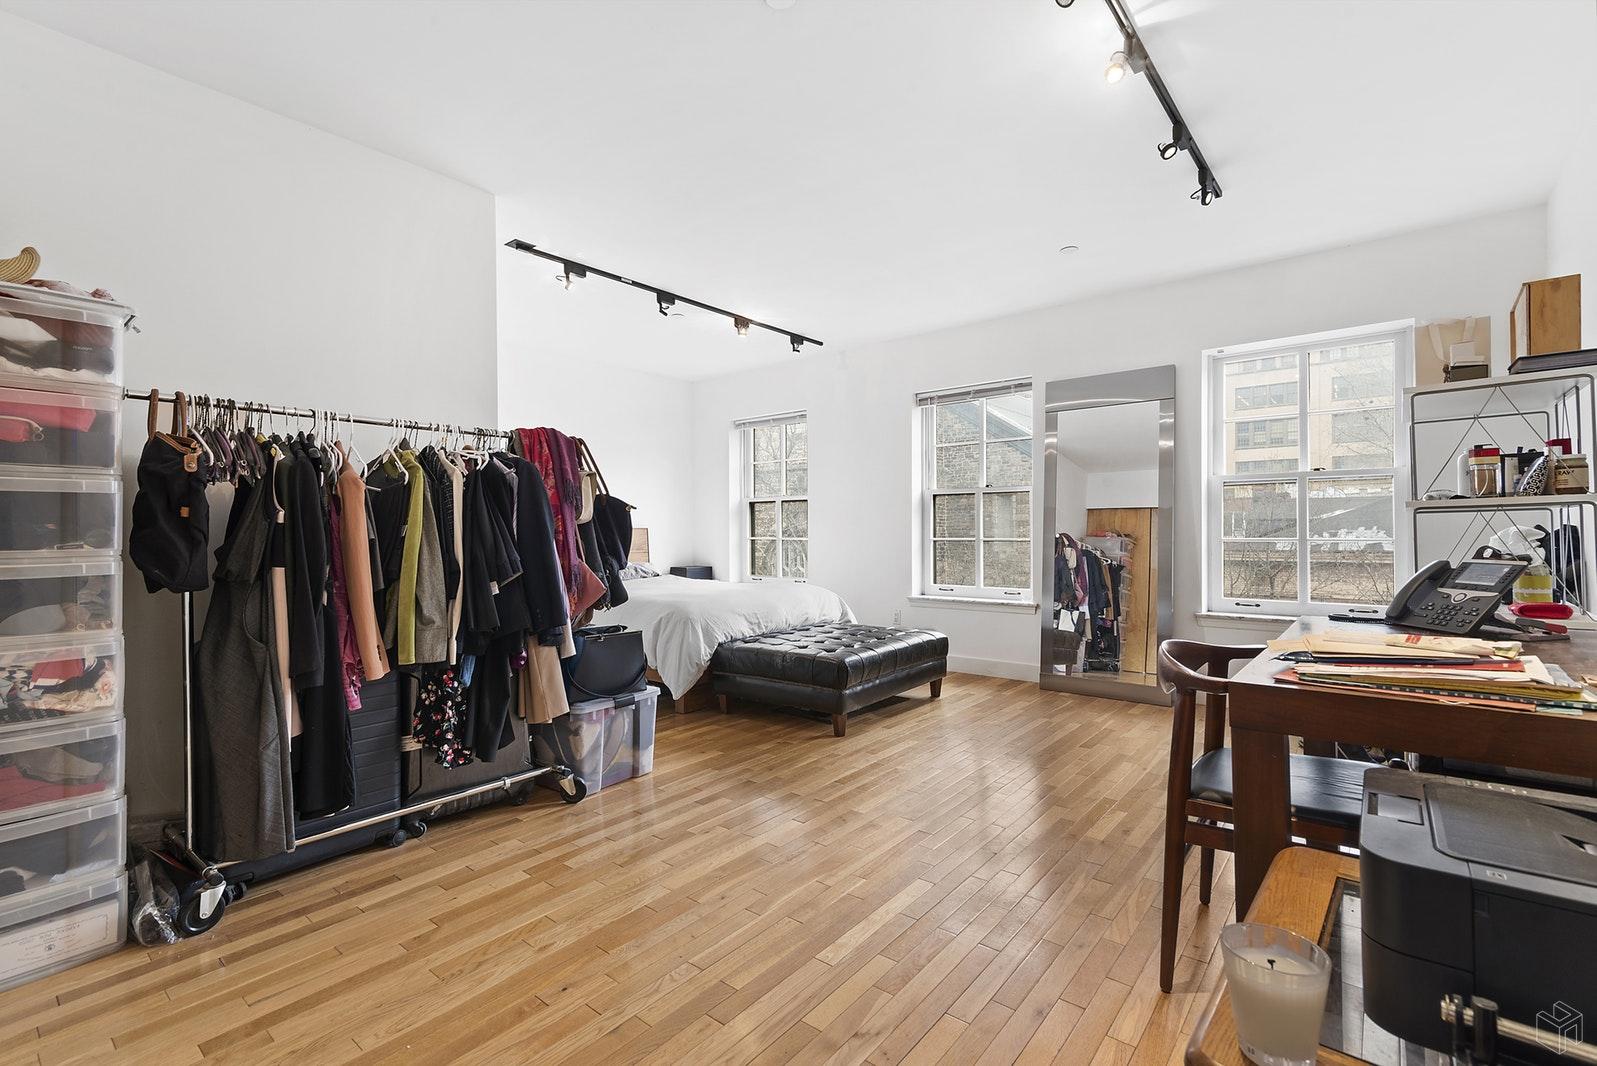 345 WEST 20TH STREET 3, Chelsea, $3,750, Web #: 19445634